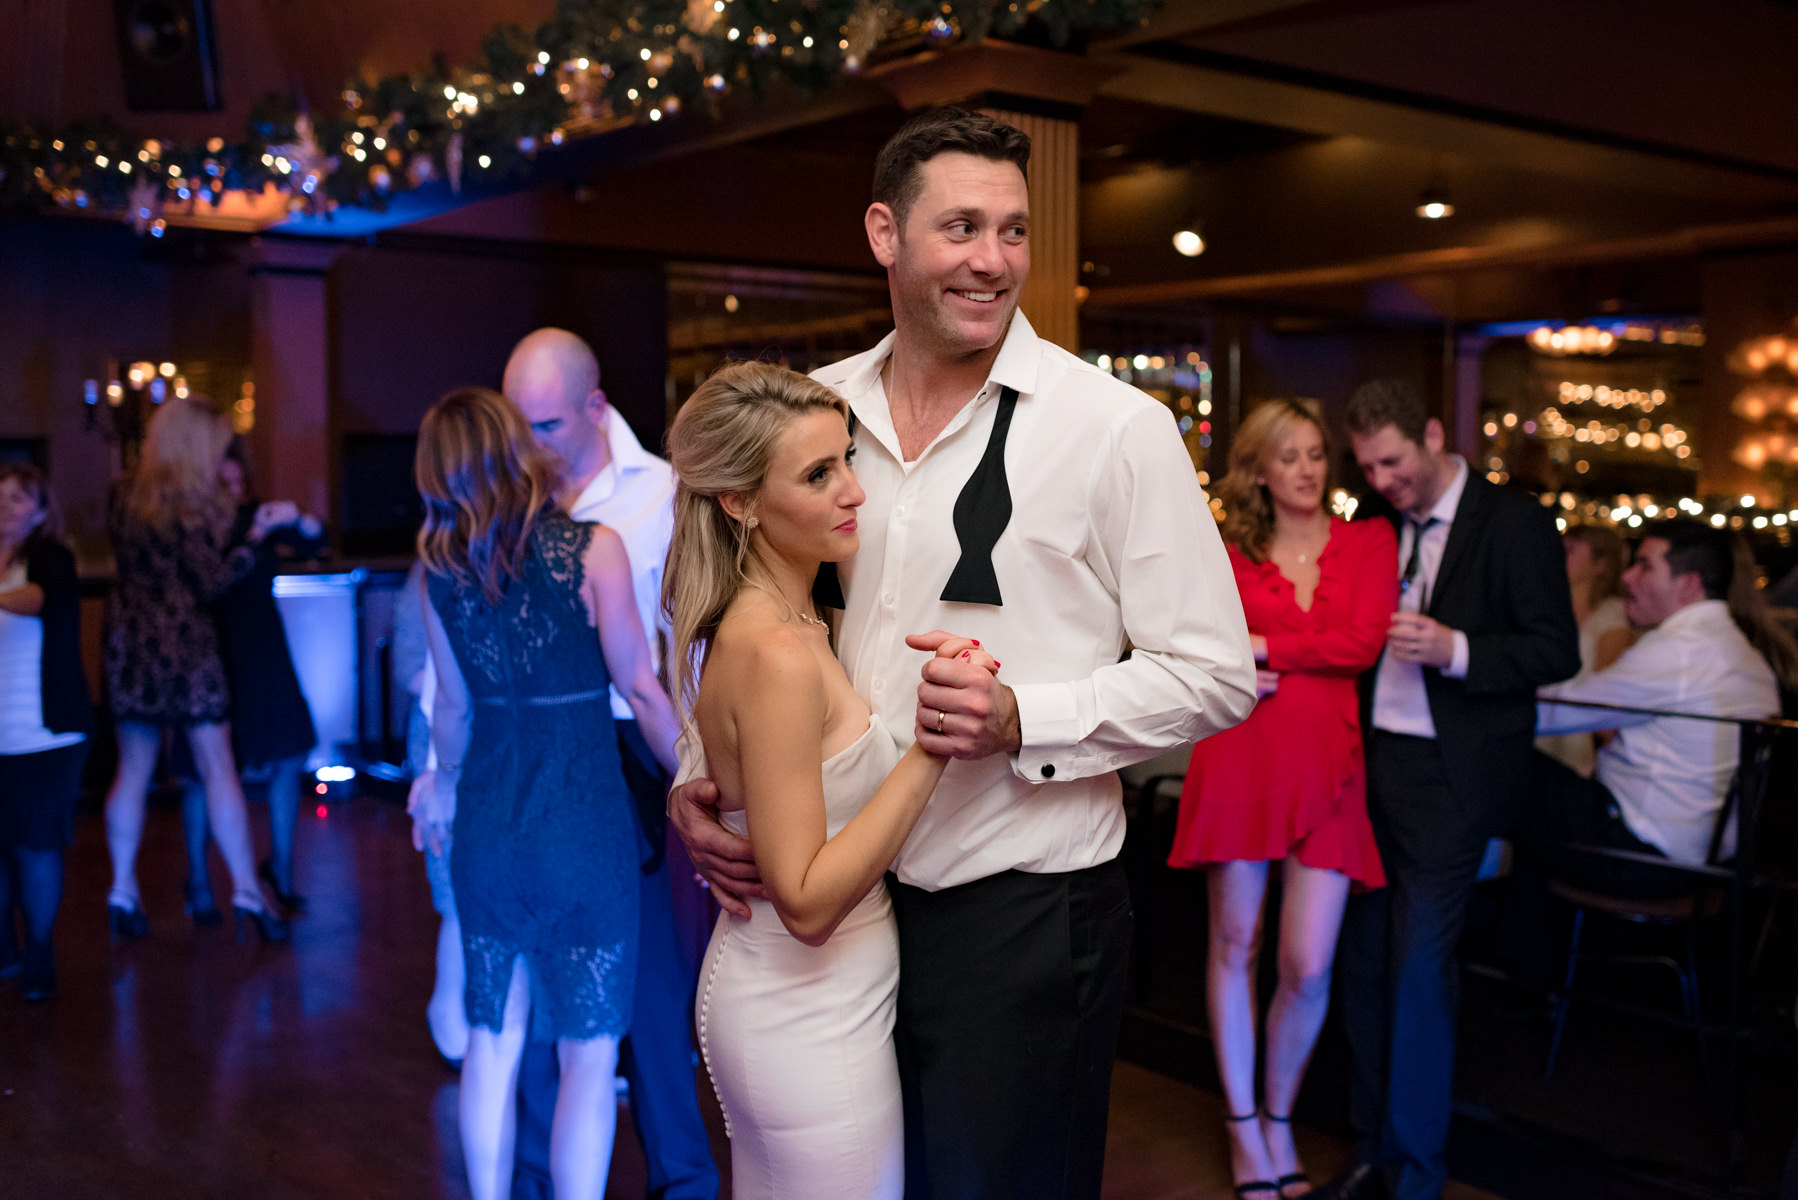 Andrew Tat - Documentary Wedding Photography - Lake Union Cafe - Seattle, Washington -Rachel and Ryan - 65.jpg